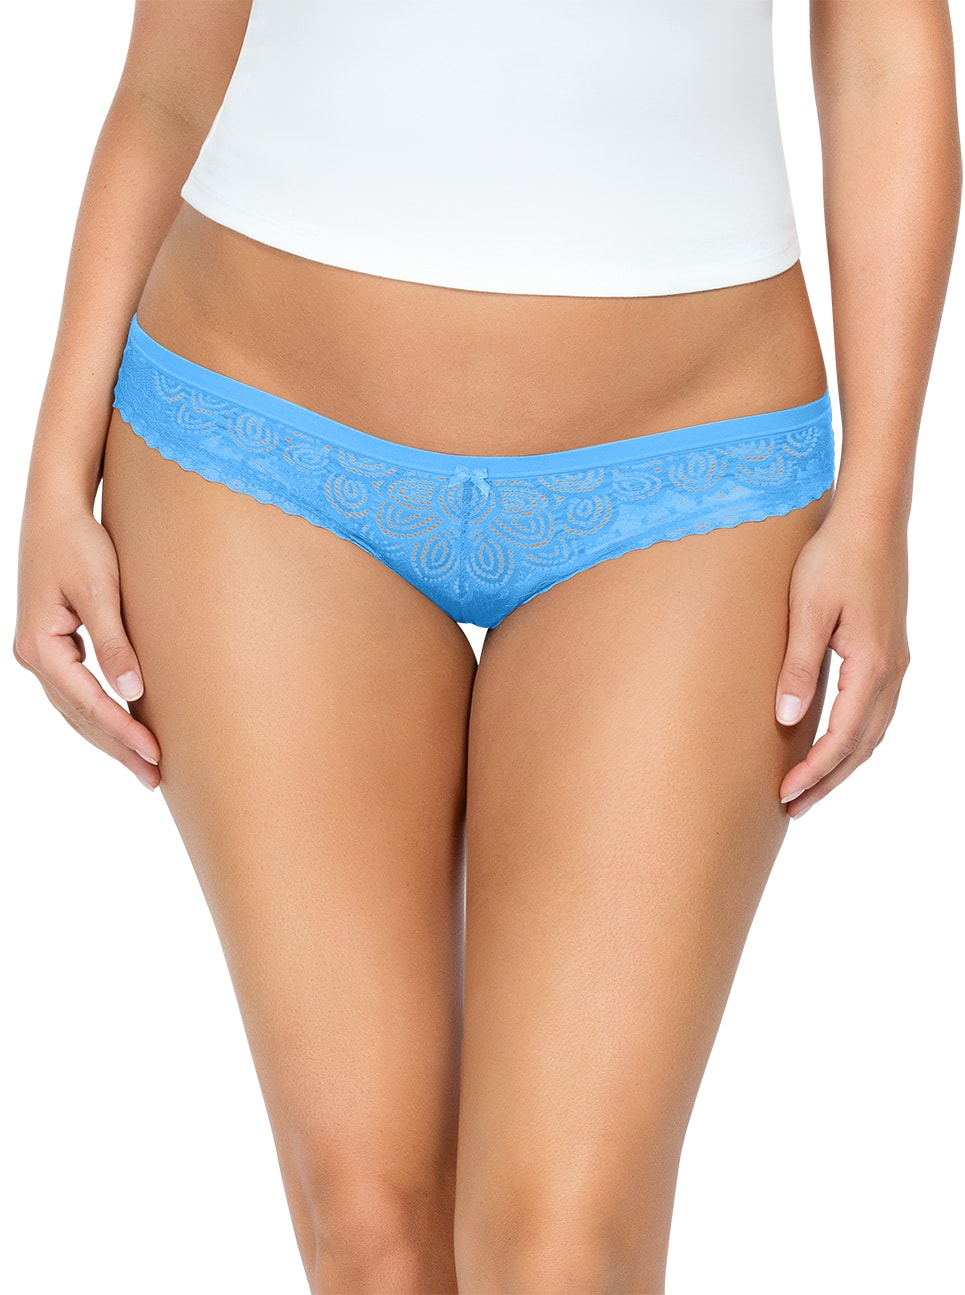 ParfaitPanty SoGlam BIKINIPP302 MediterraneanBlue FRONT - Panty So Glam Bikini - Mediterranean Blue - PP302